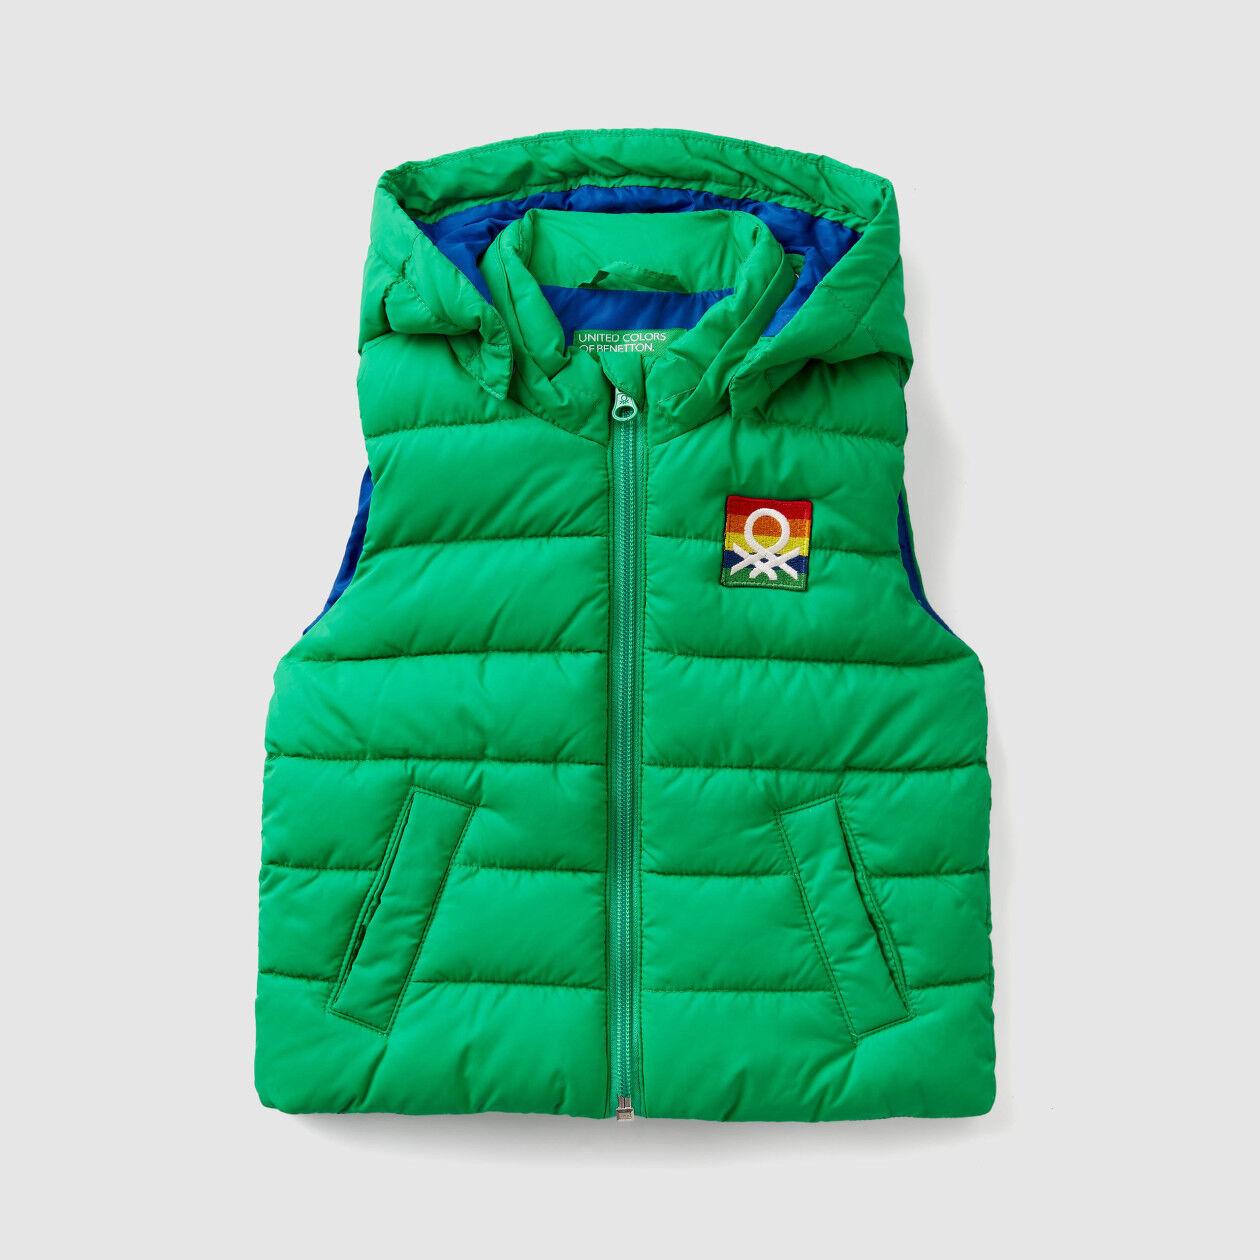 """Rain defender"" sleeveless jacket"